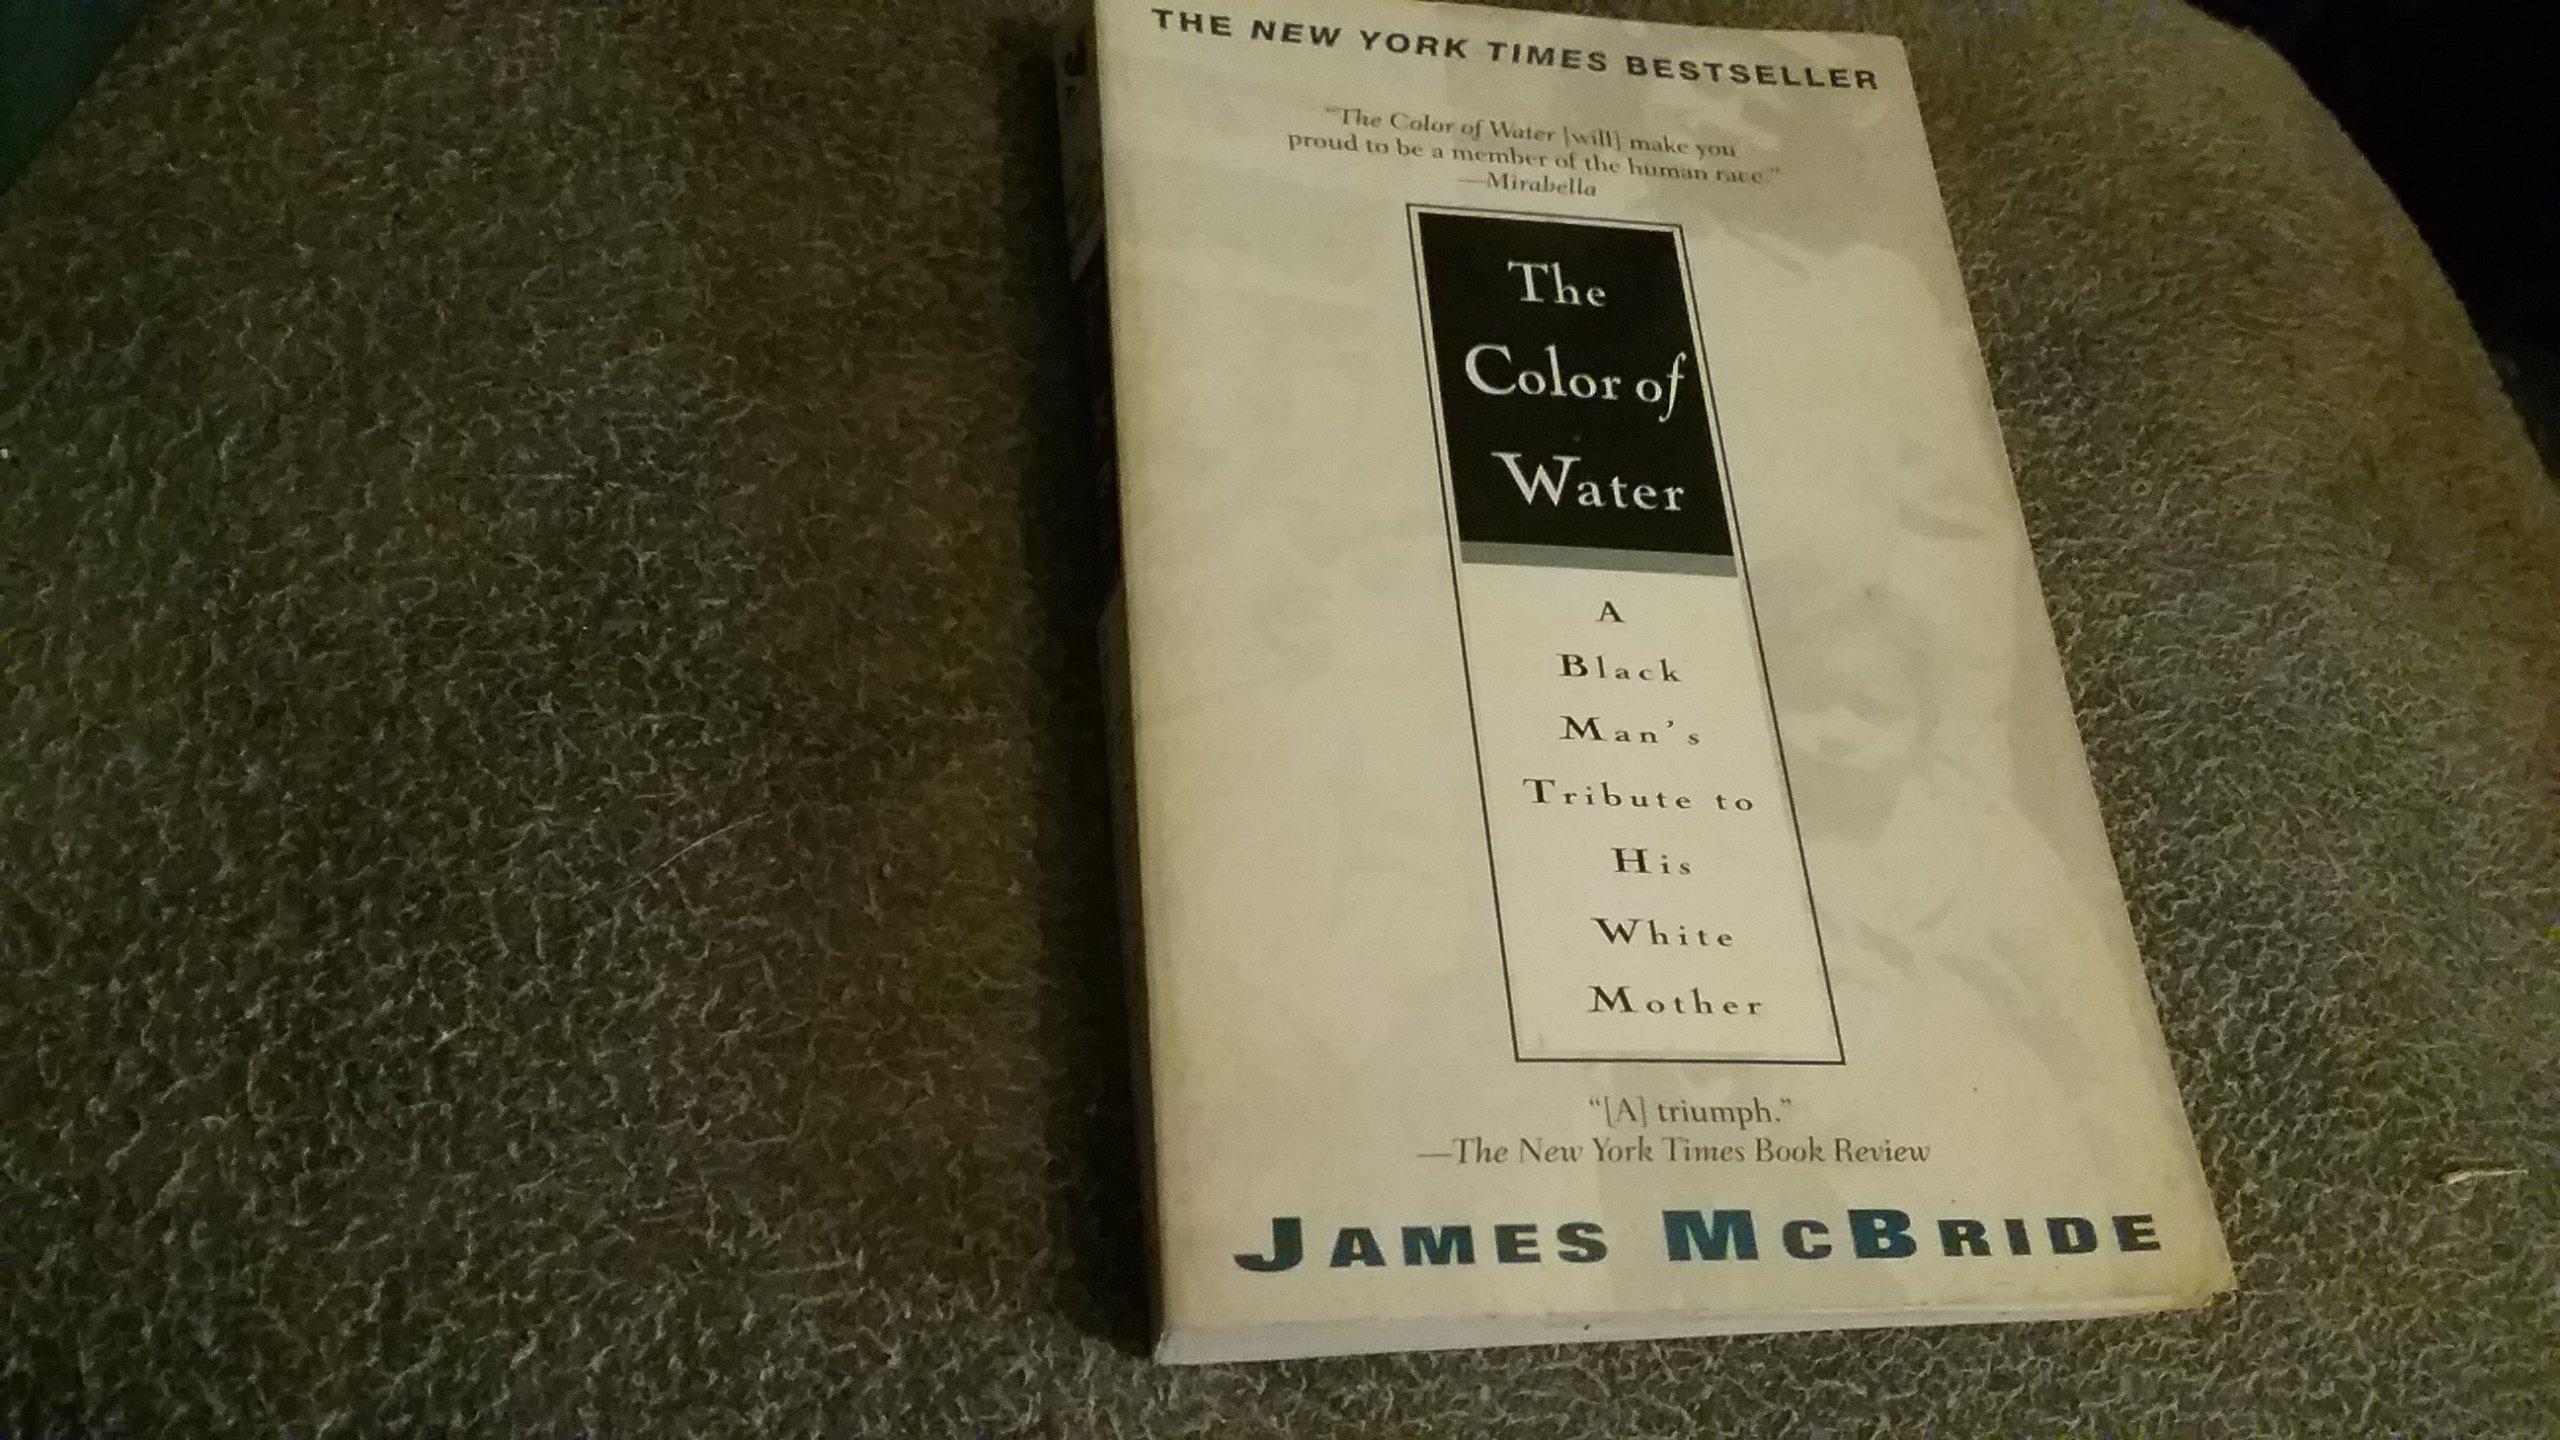 Amazon.it: The Color of Water - James McBride - Libri